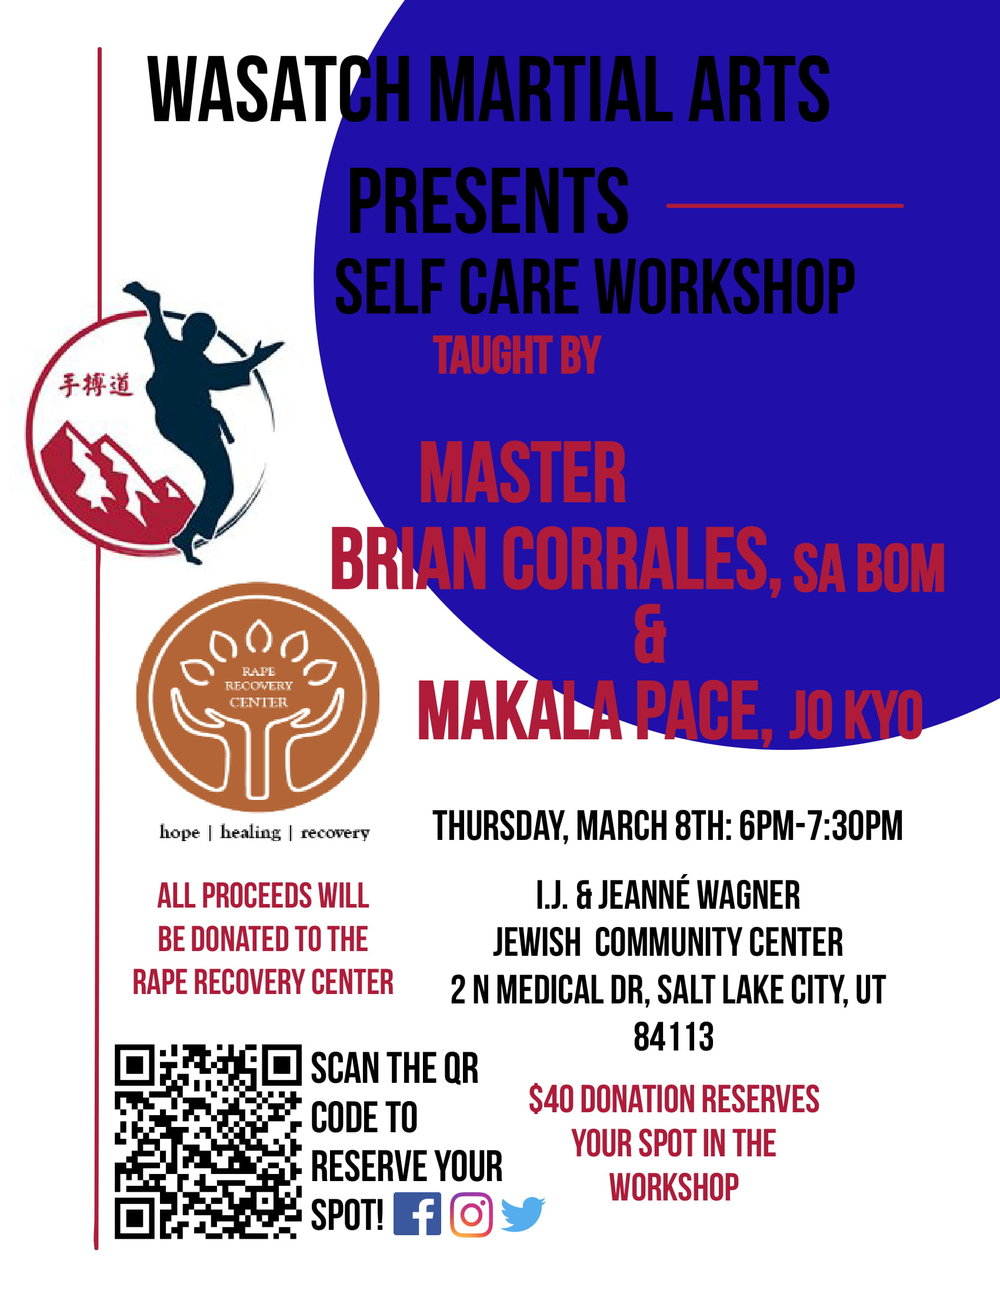 RRC - Wasatch Martial Arts  (1)-1.jpg